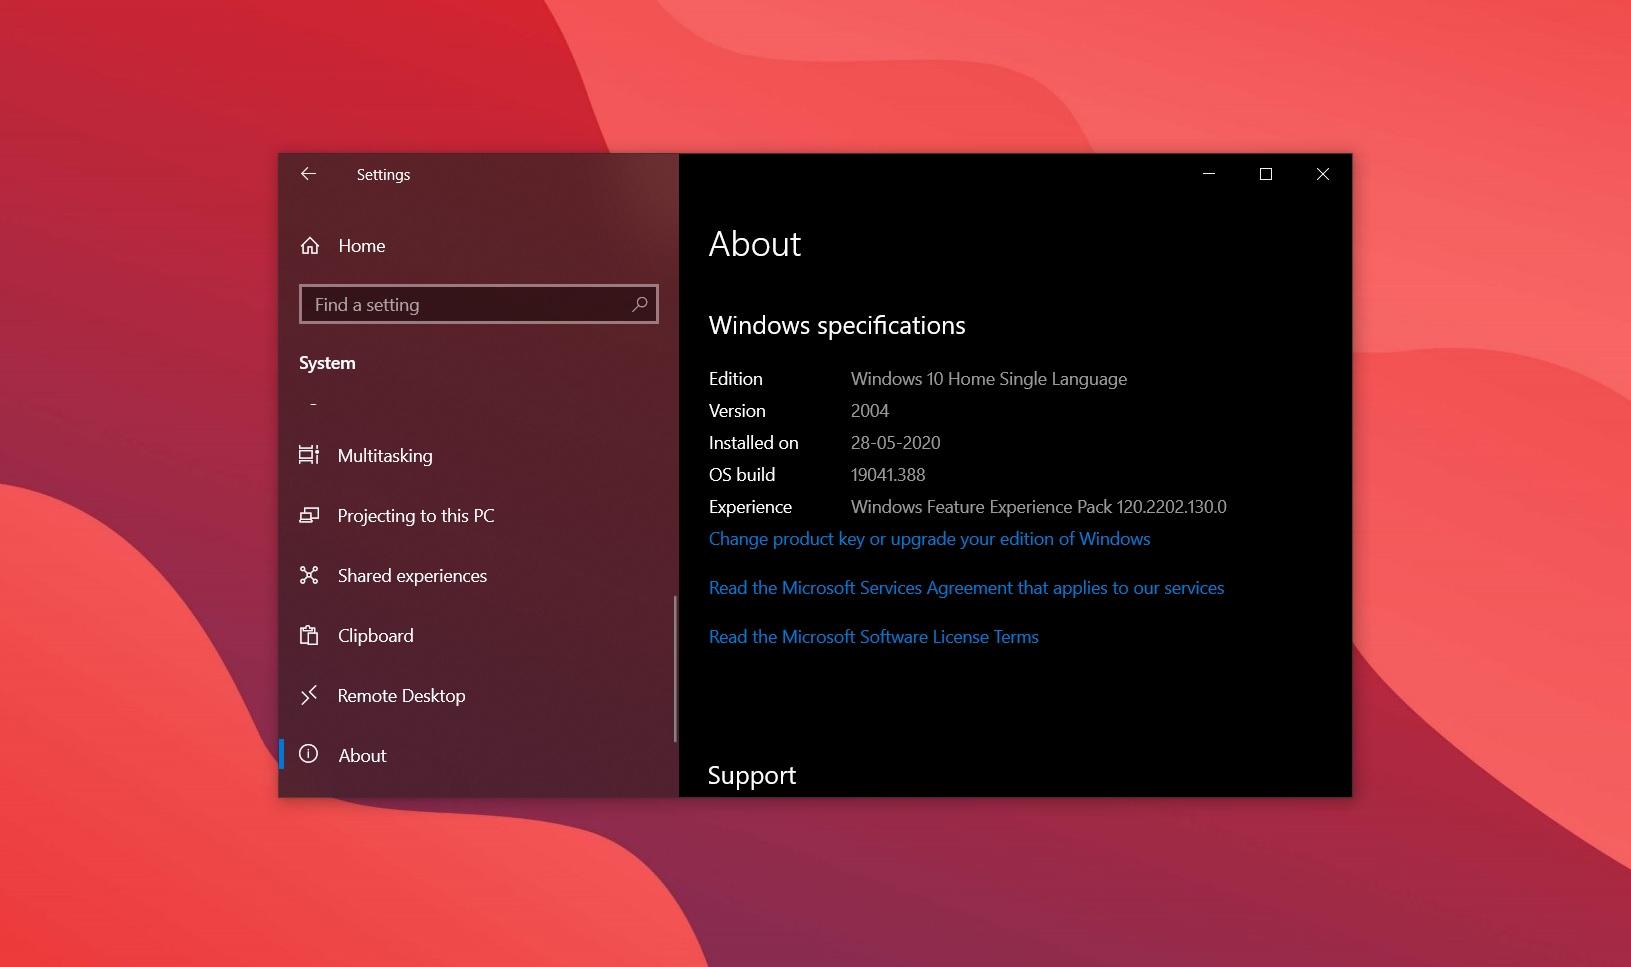 Windows 10 version 2004 upgrade